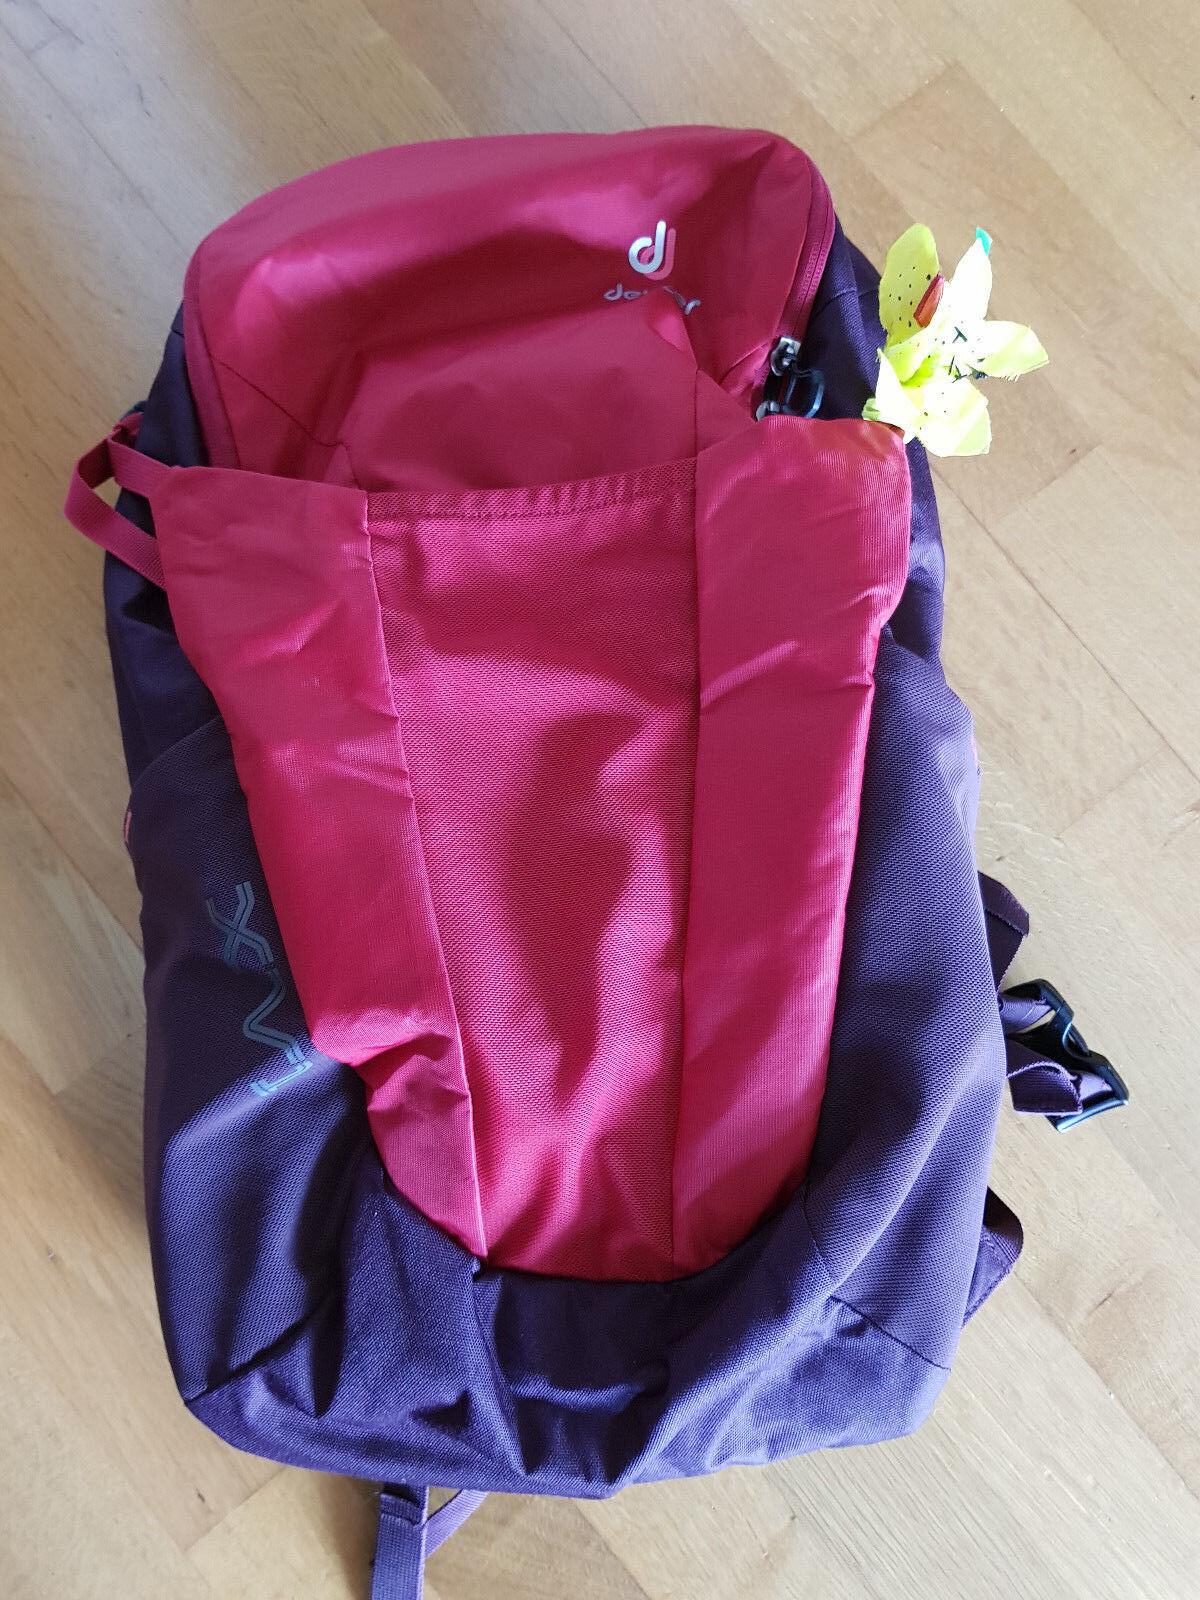 Deuter Rucksack Damen XV 1 sl, cranberry-aubergine *wie neu*